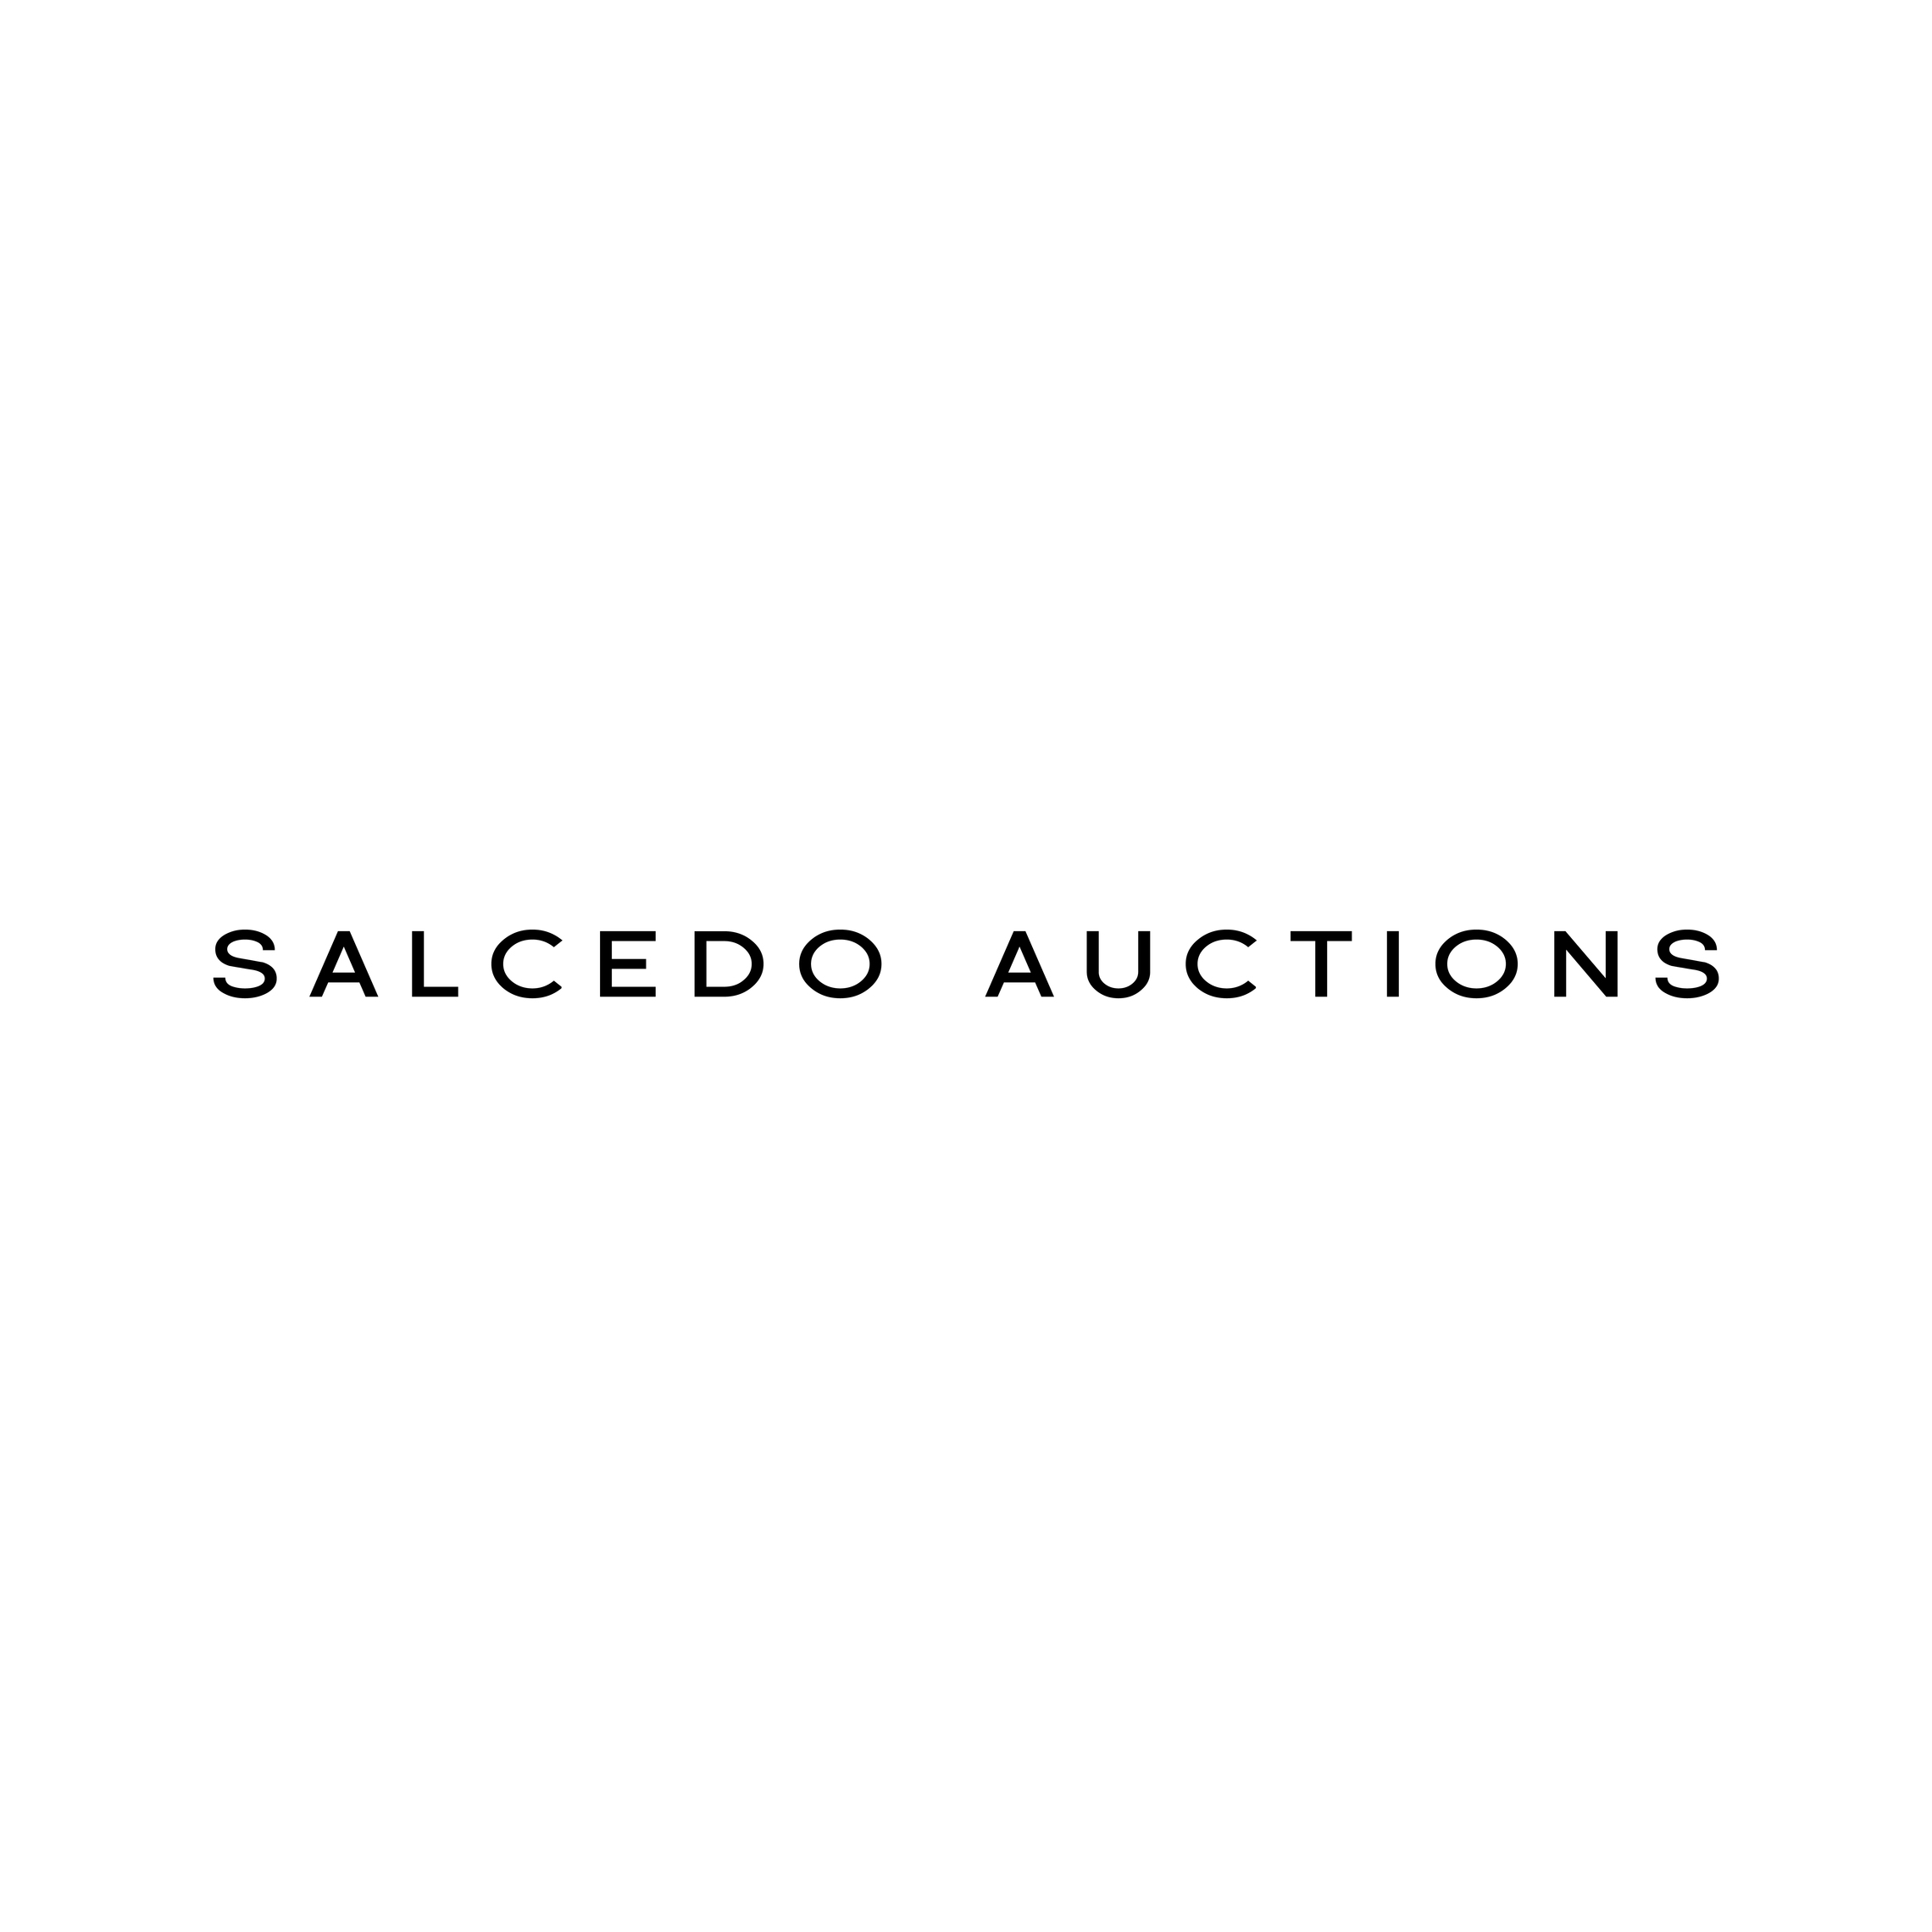 salcedo auctions- company logo